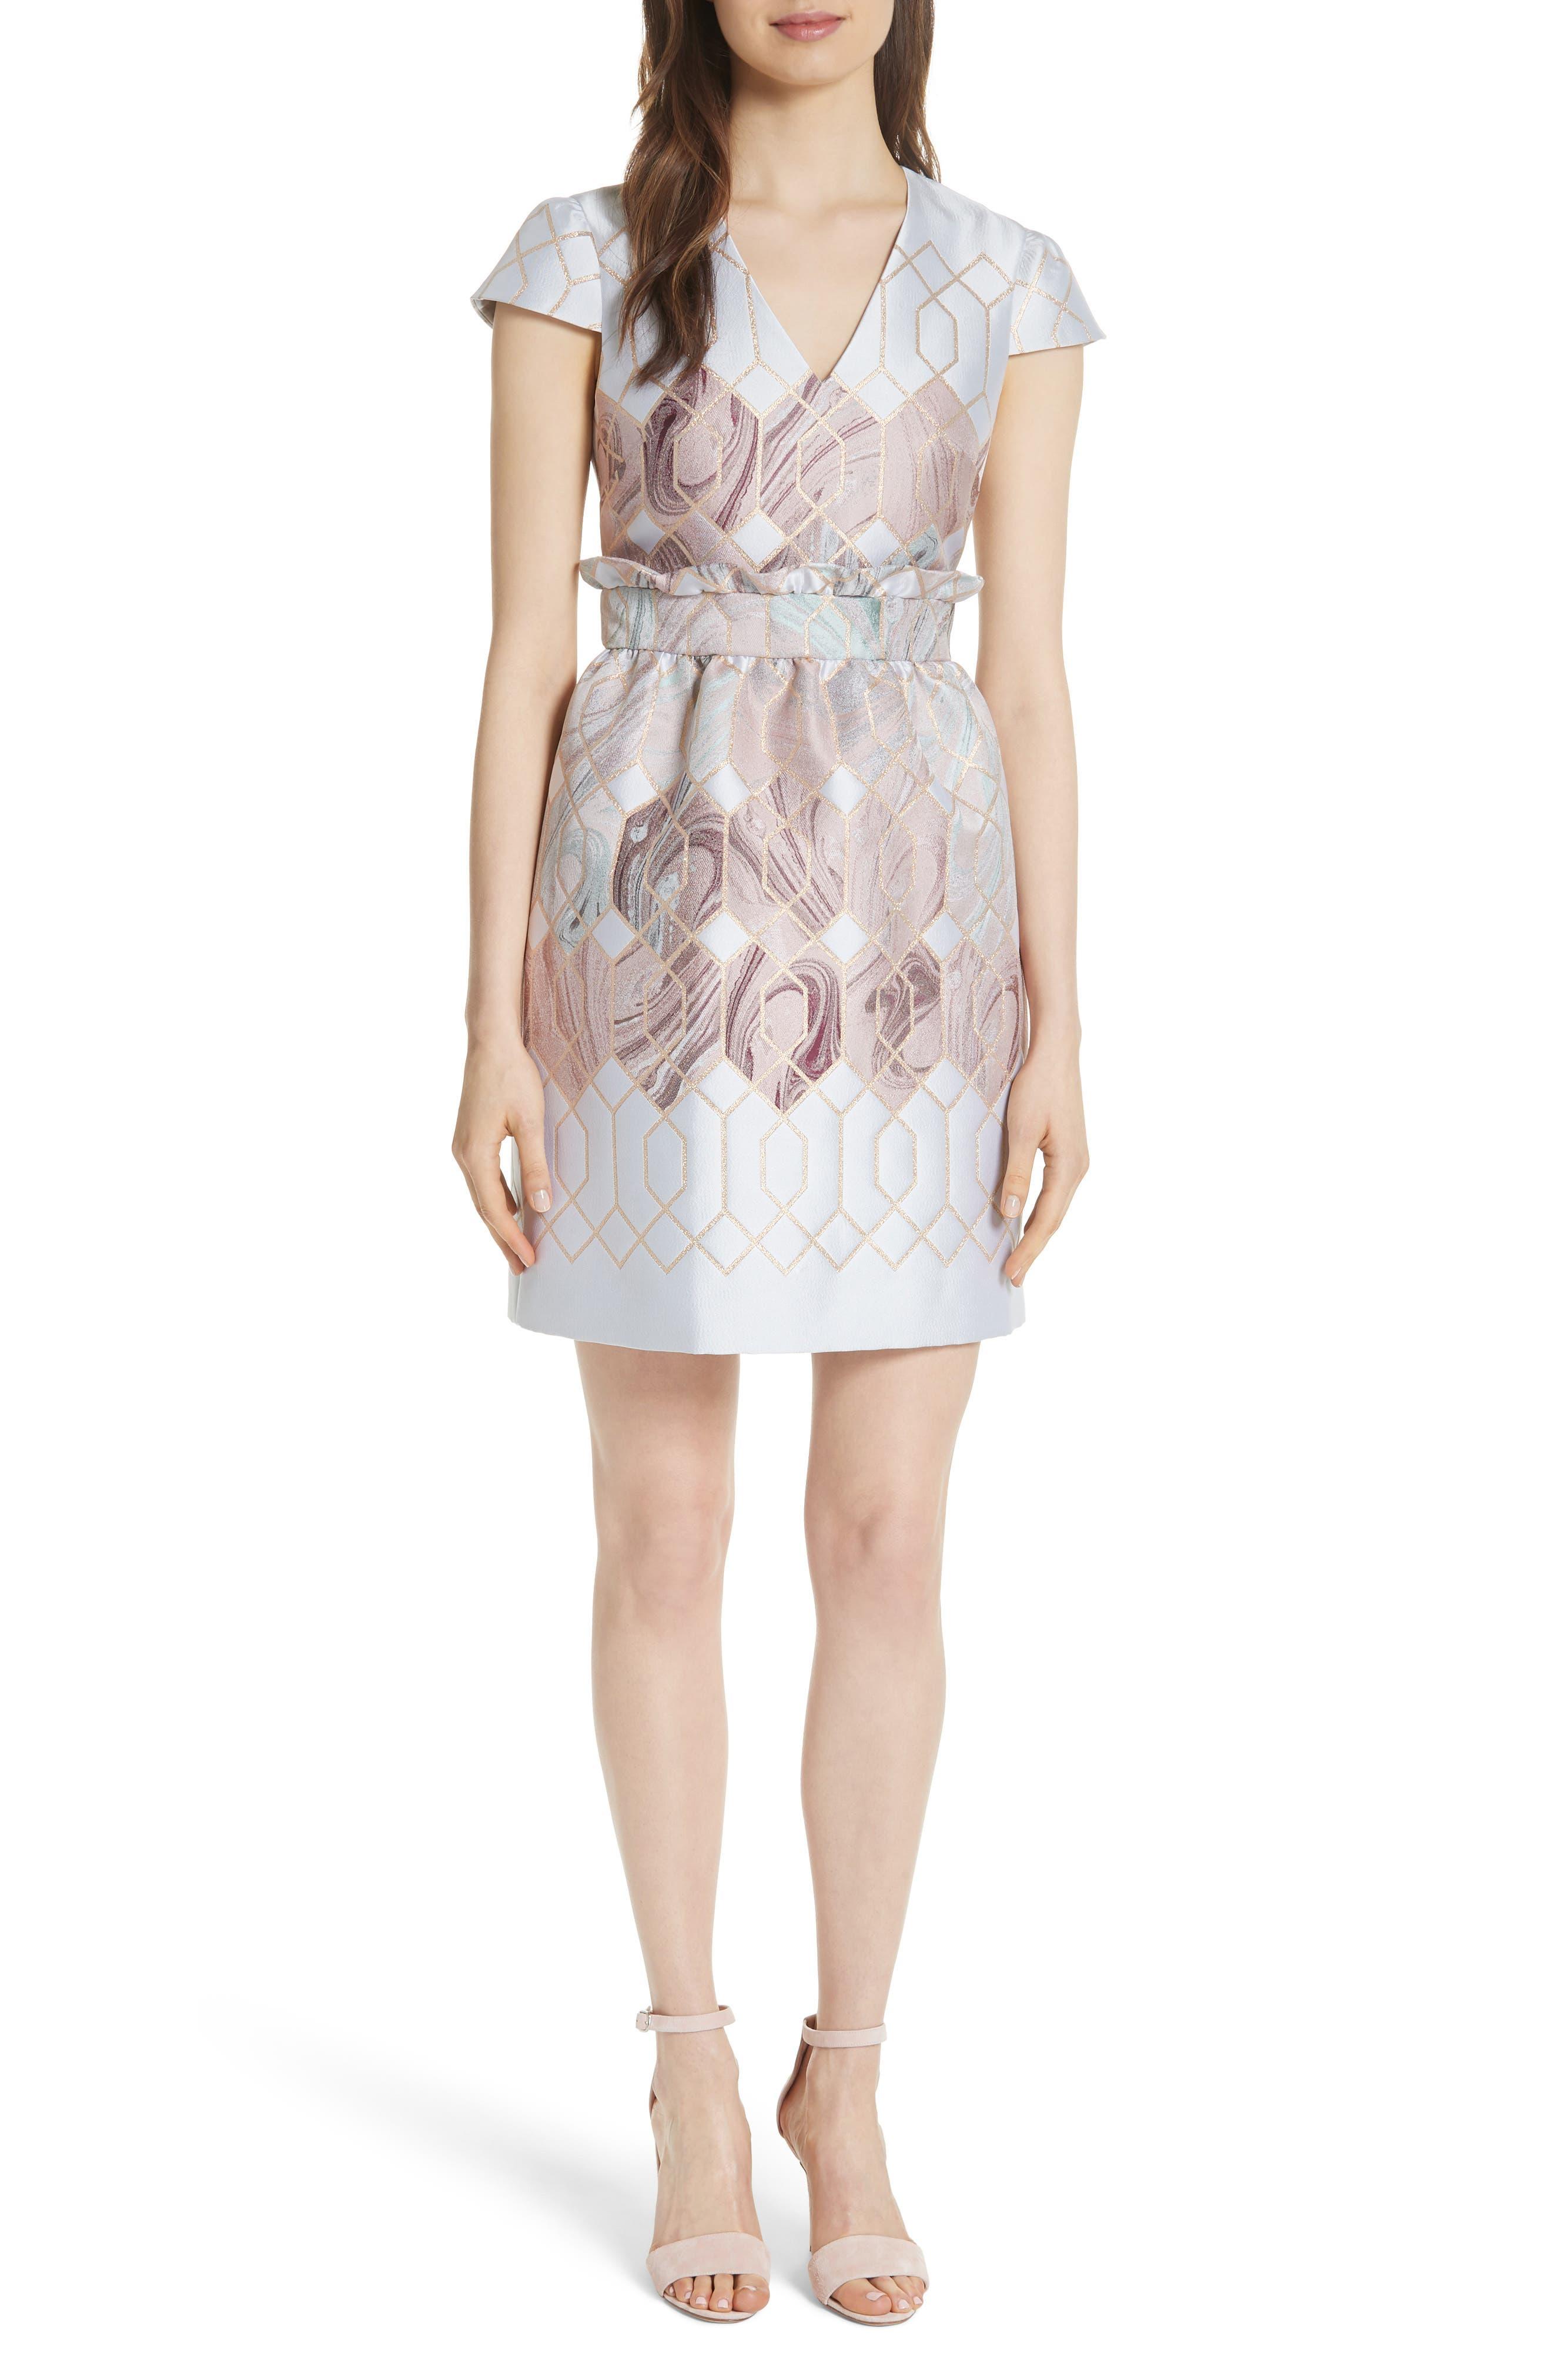 Ingrida Sea of Clouds Tulip Dress,                         Main,                         color, White